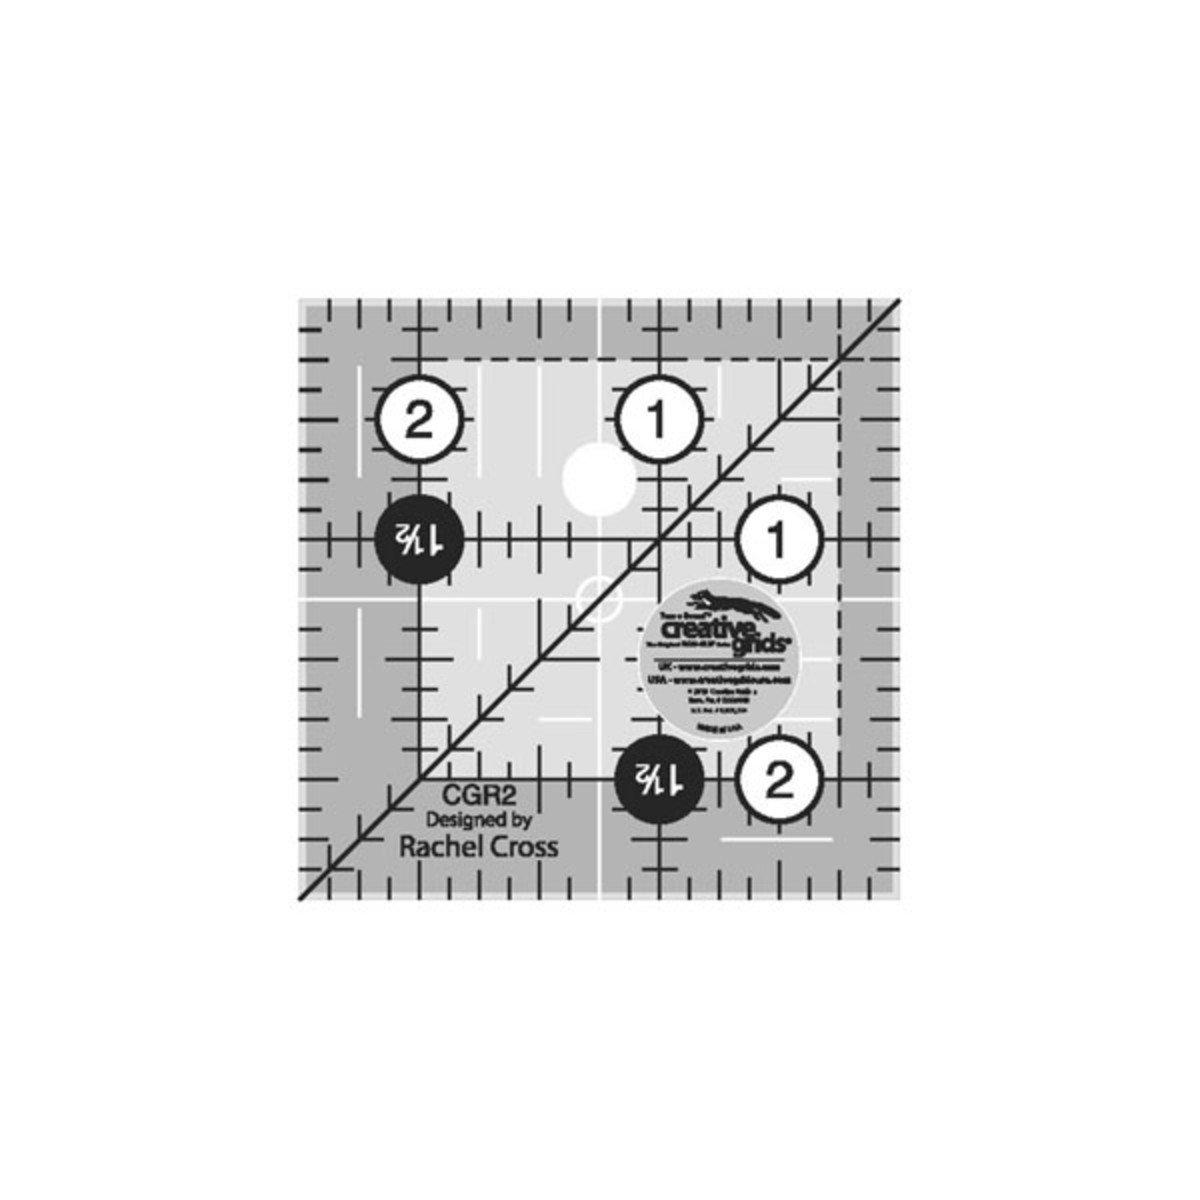 Creative Grids 2 1/2 X 2 1/2